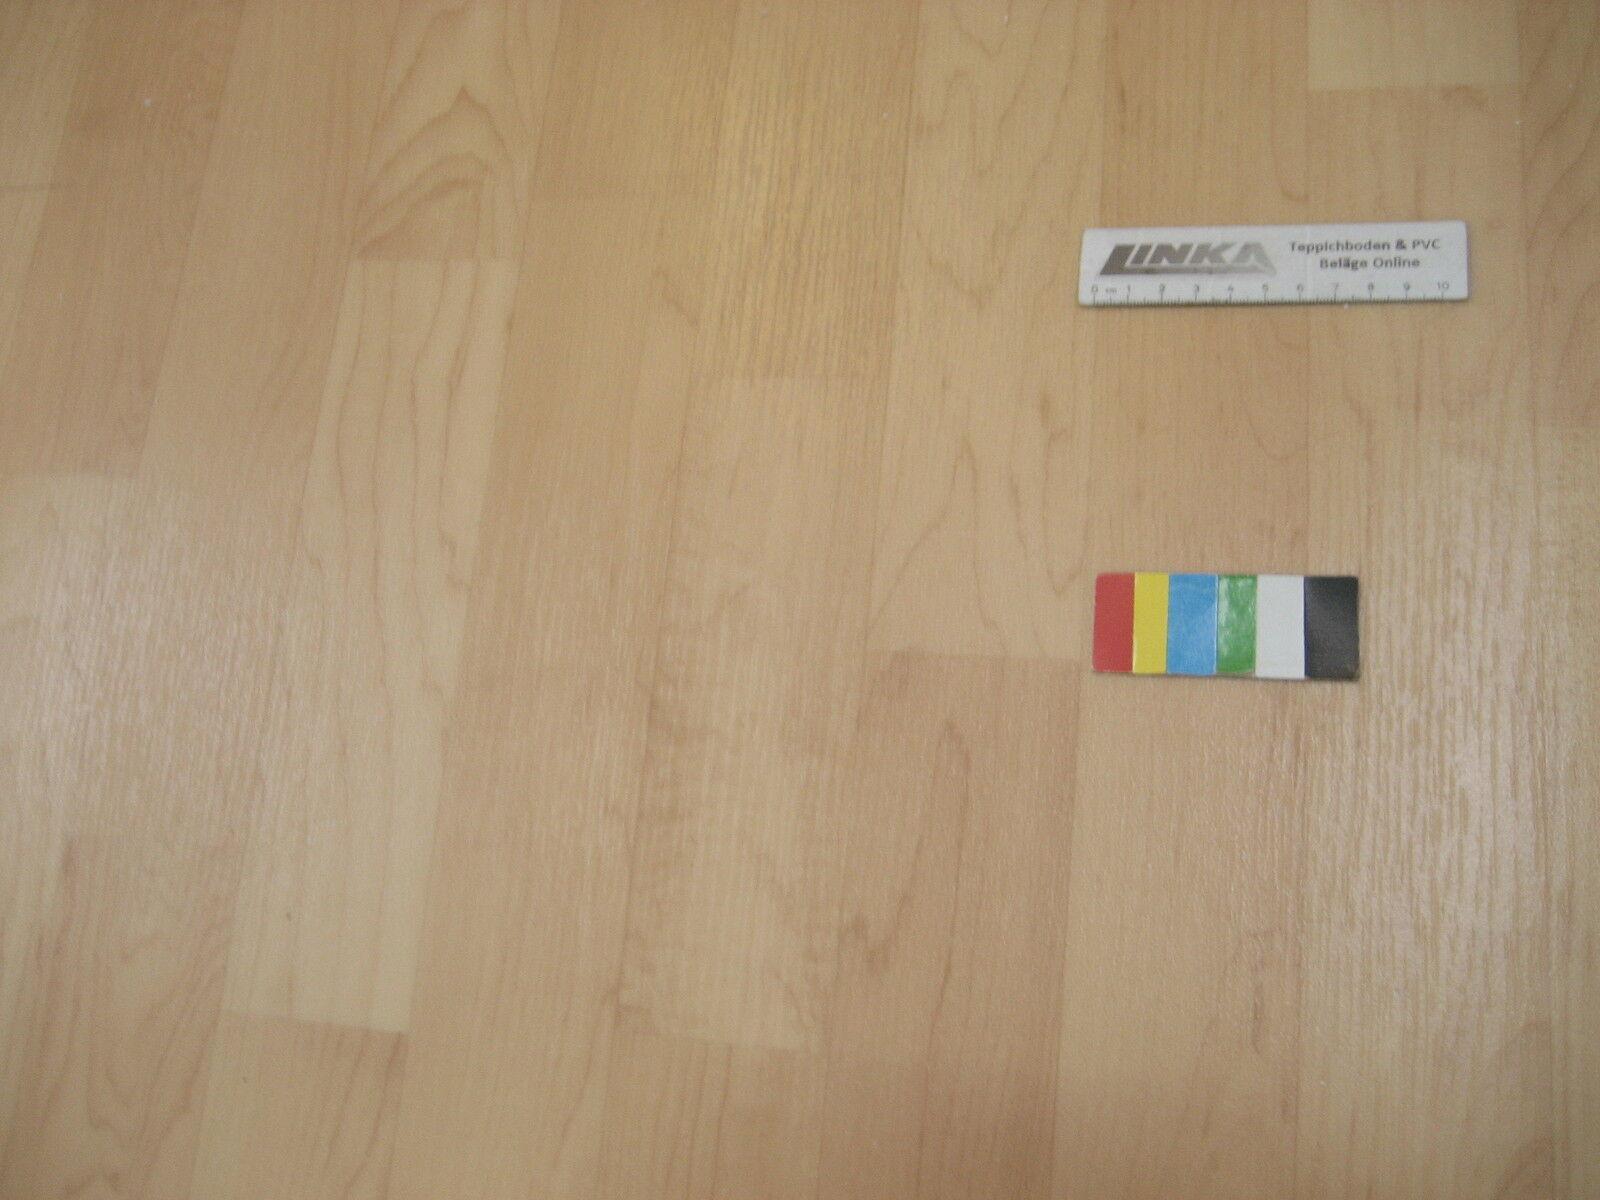 7192 hochwertig sehr 202x401 PVC Belag Rest Boden Bodenbelag ...